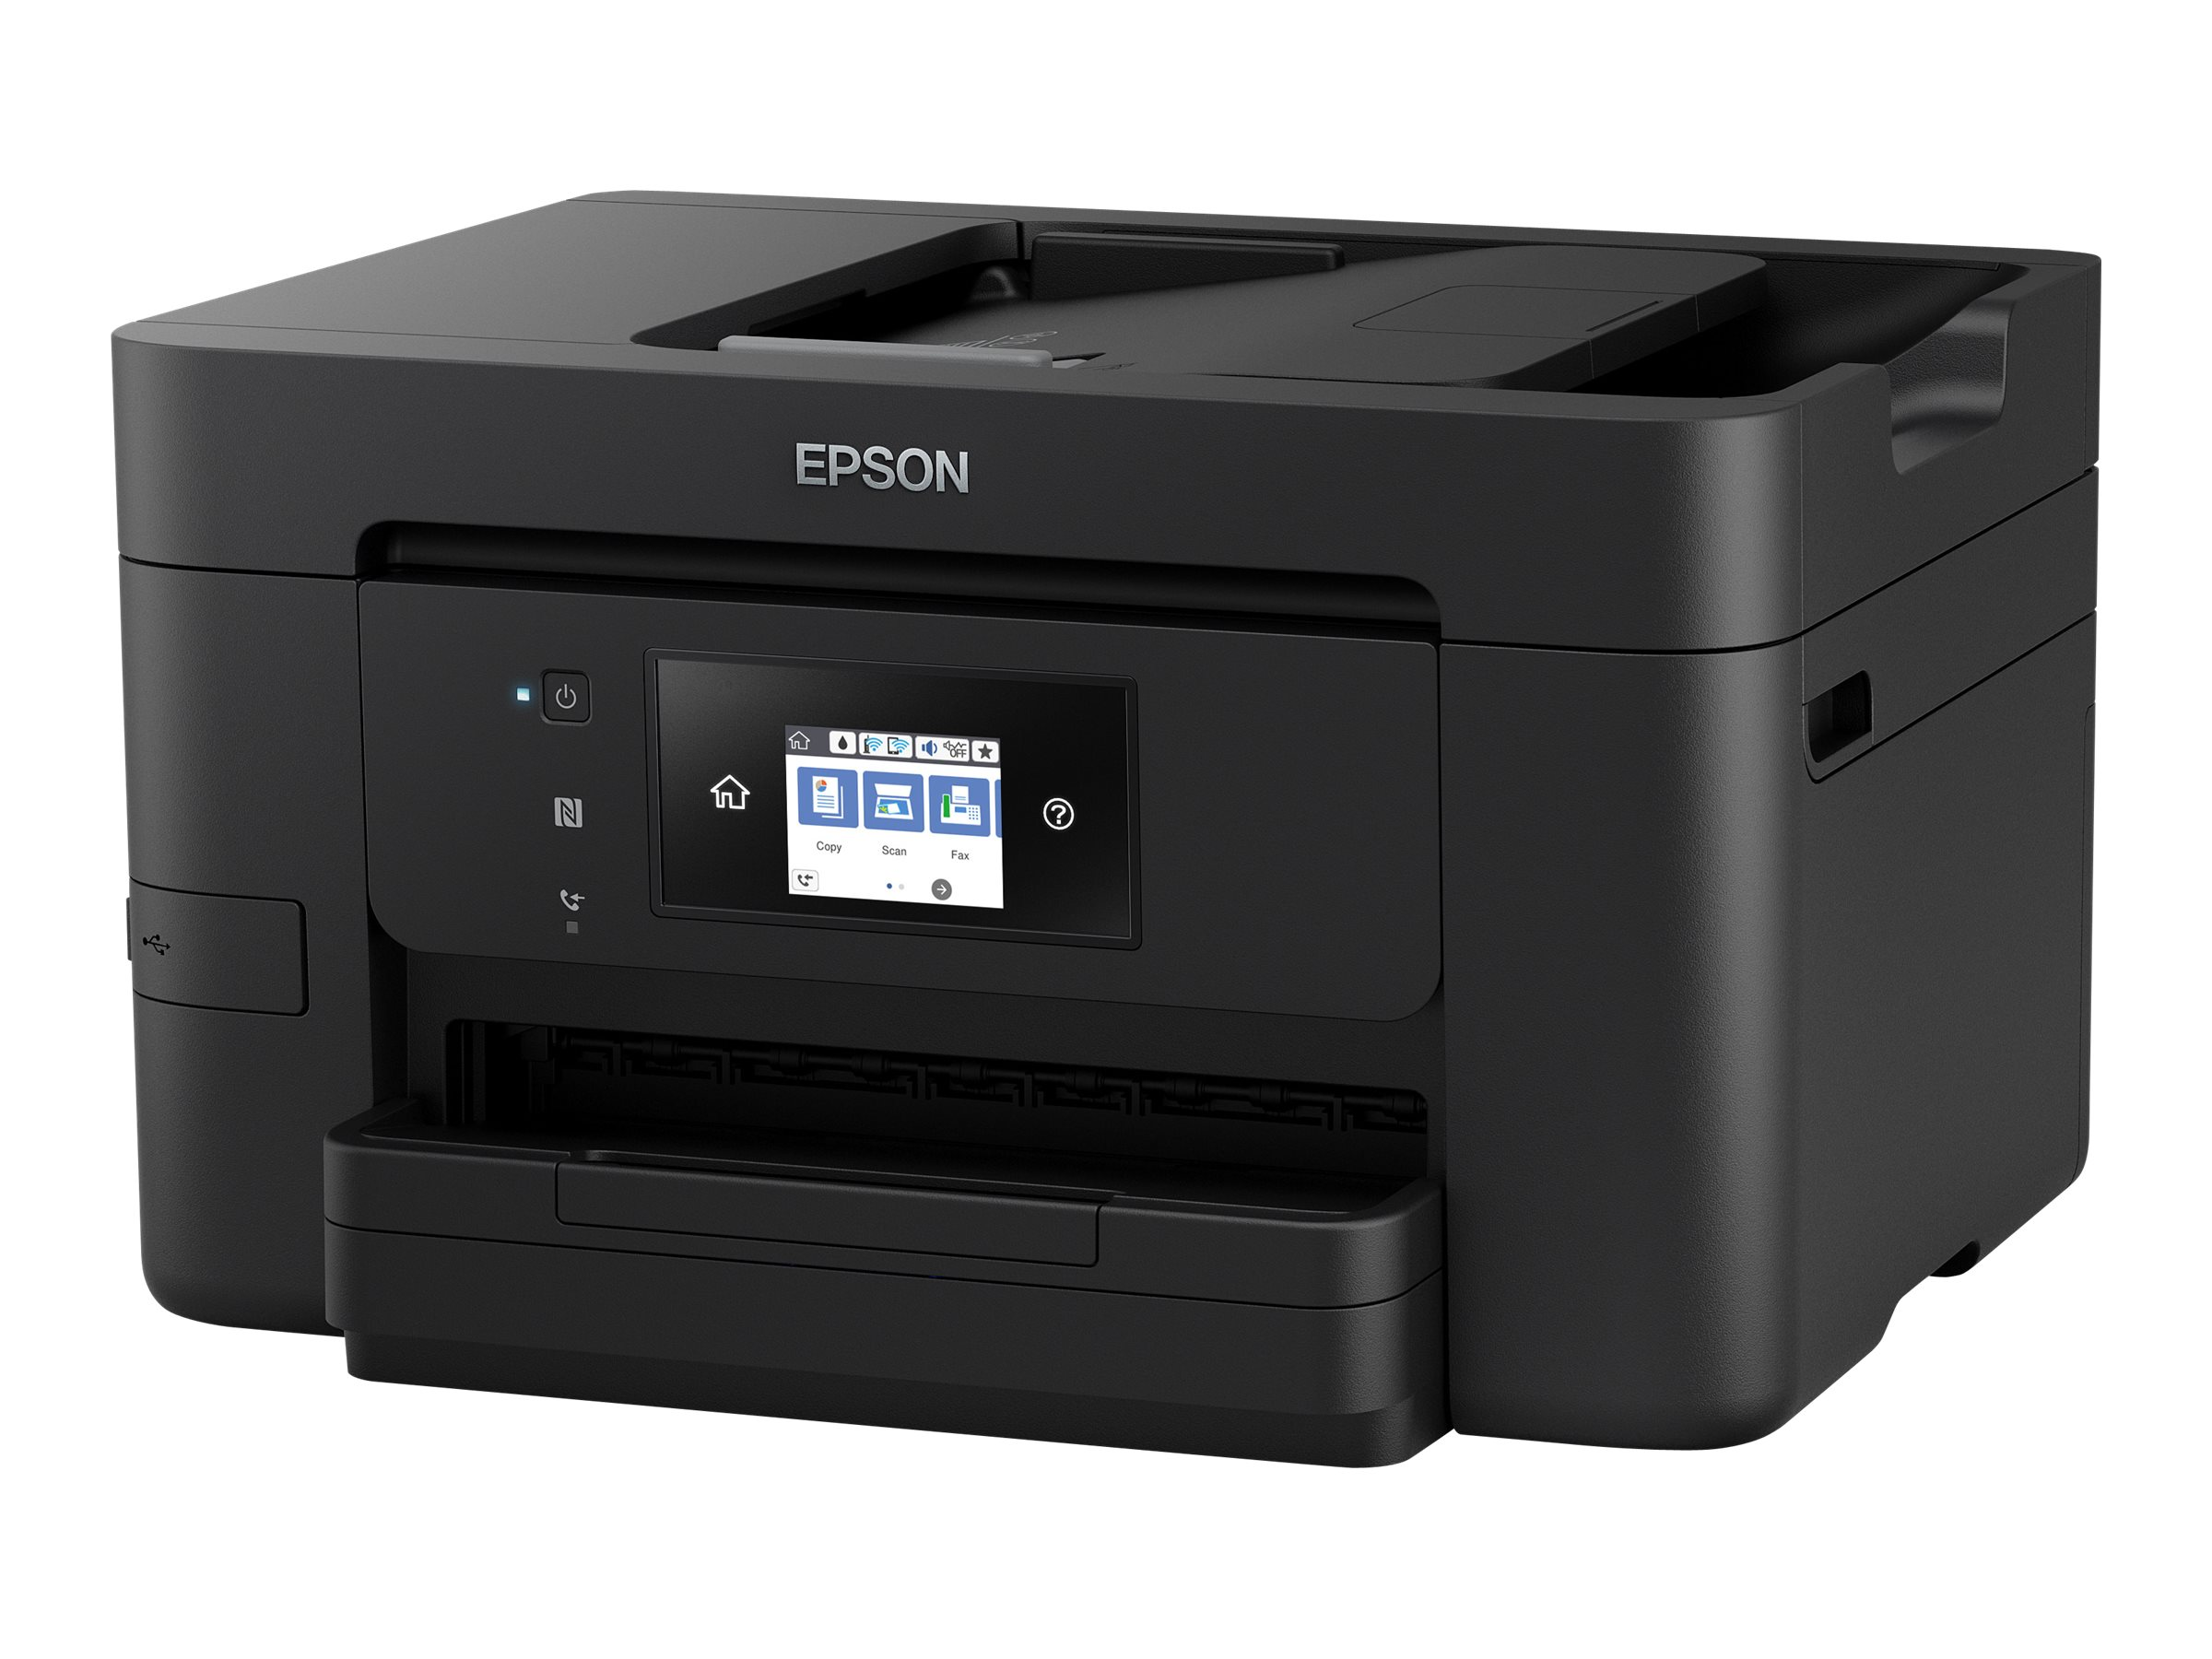 Epson WorkForce Pro WF-4725DWF - Multifunktionsdrucker - Farbe - Tintenstrahl - A4 (210 x 297 mm) (Original) - A4/Legal (Medien)